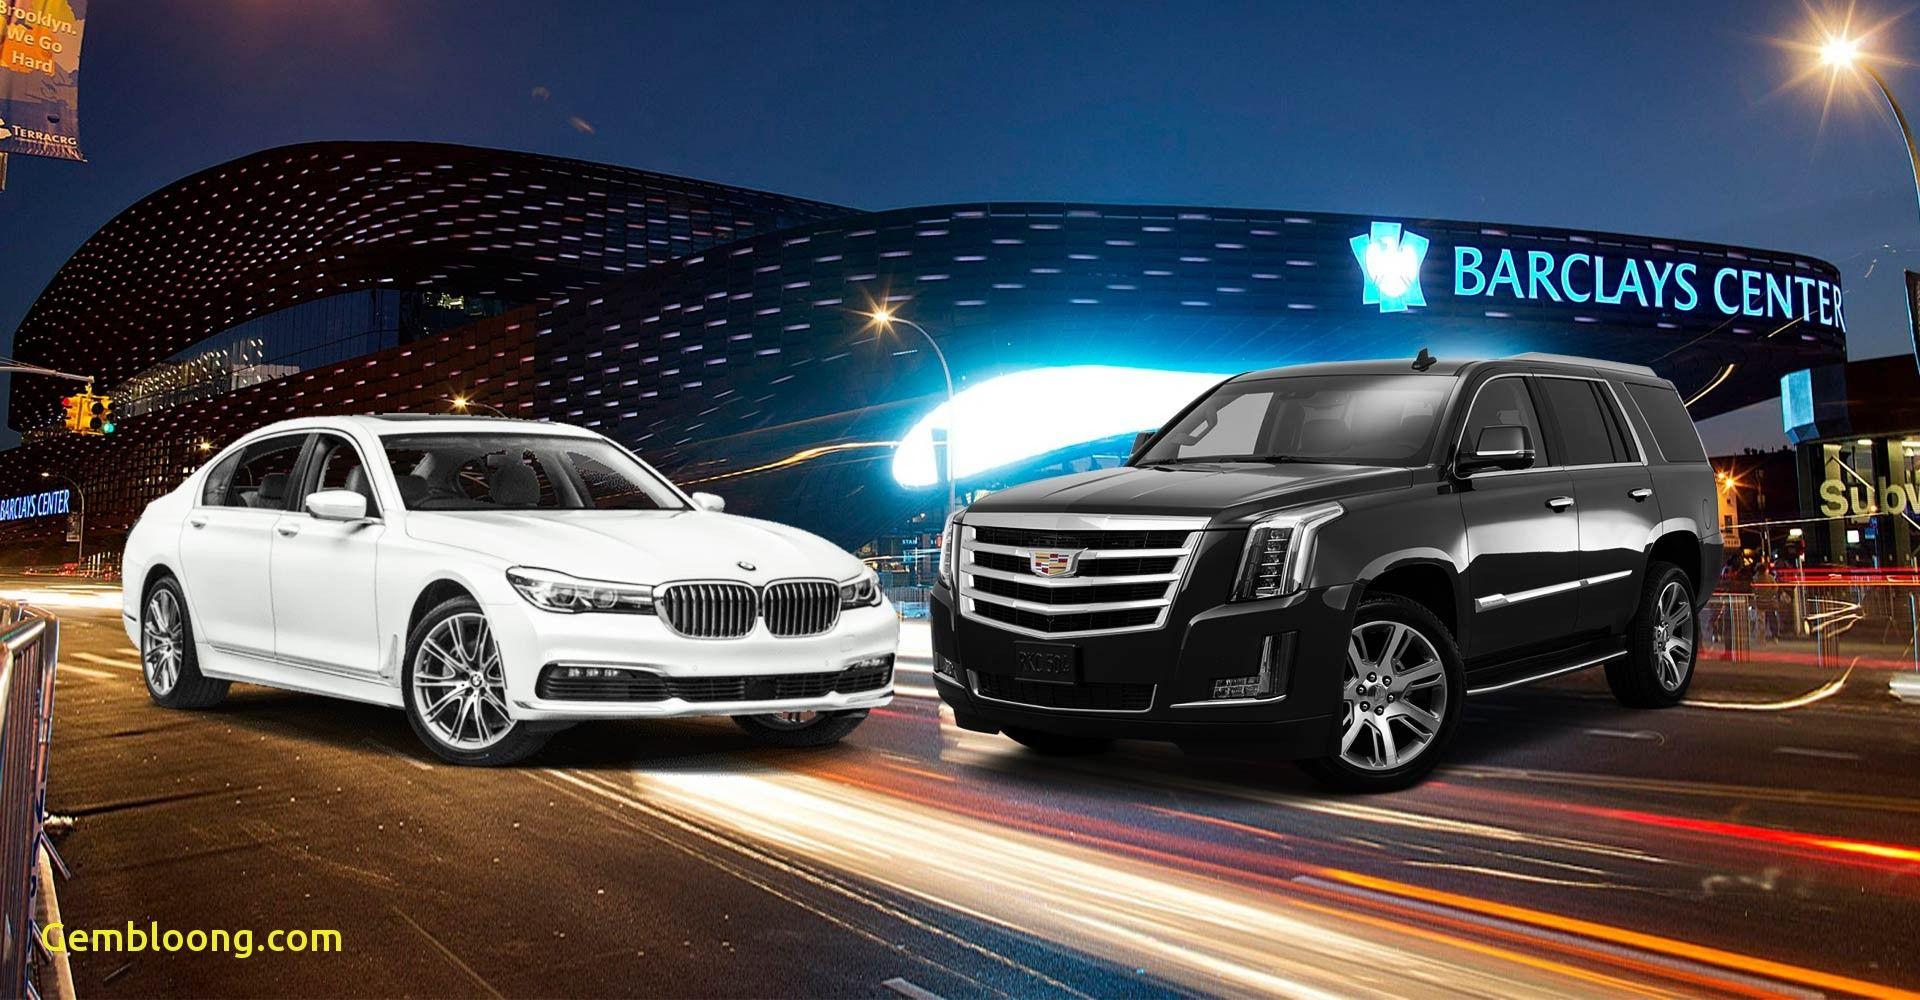 Used Car Dealerships Near Me Bad Credit >> Luxury Bad Credit Used Car Dealerships Near Me Automotive